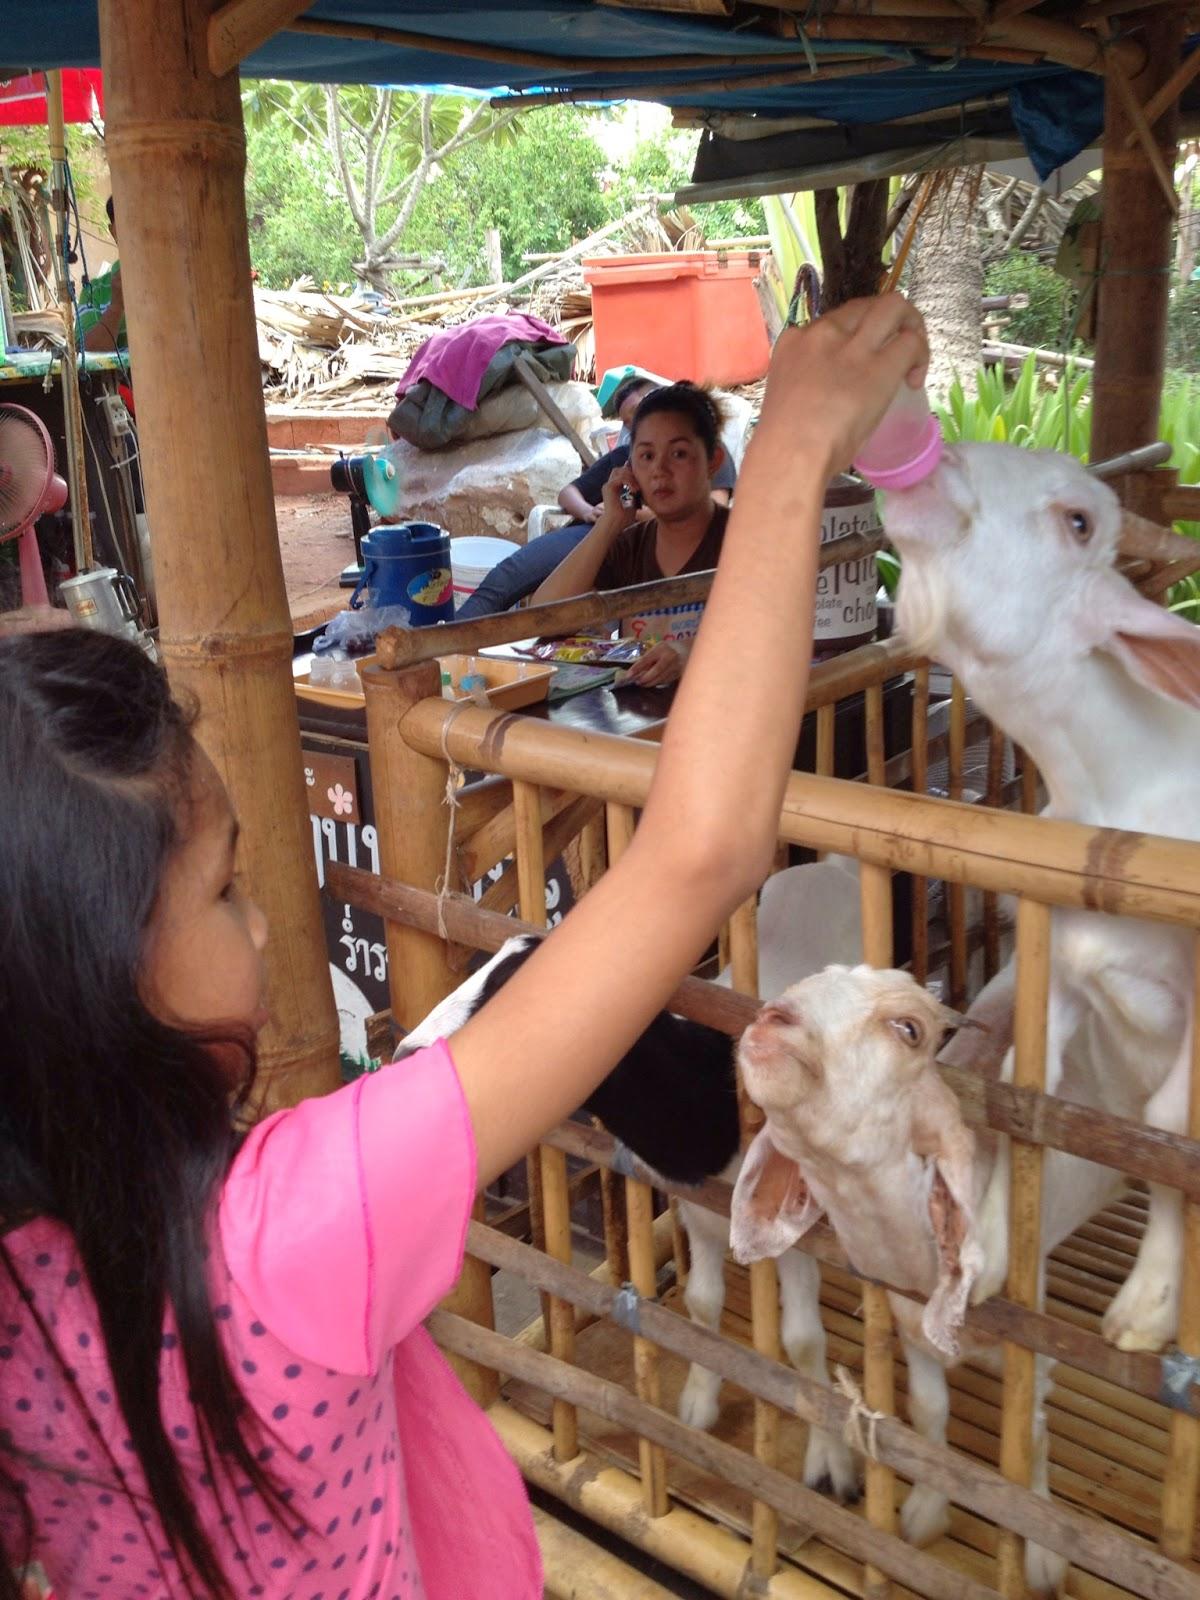 Ayutthaya - Feed some penned in baby goats at Ayothaya Floating Market